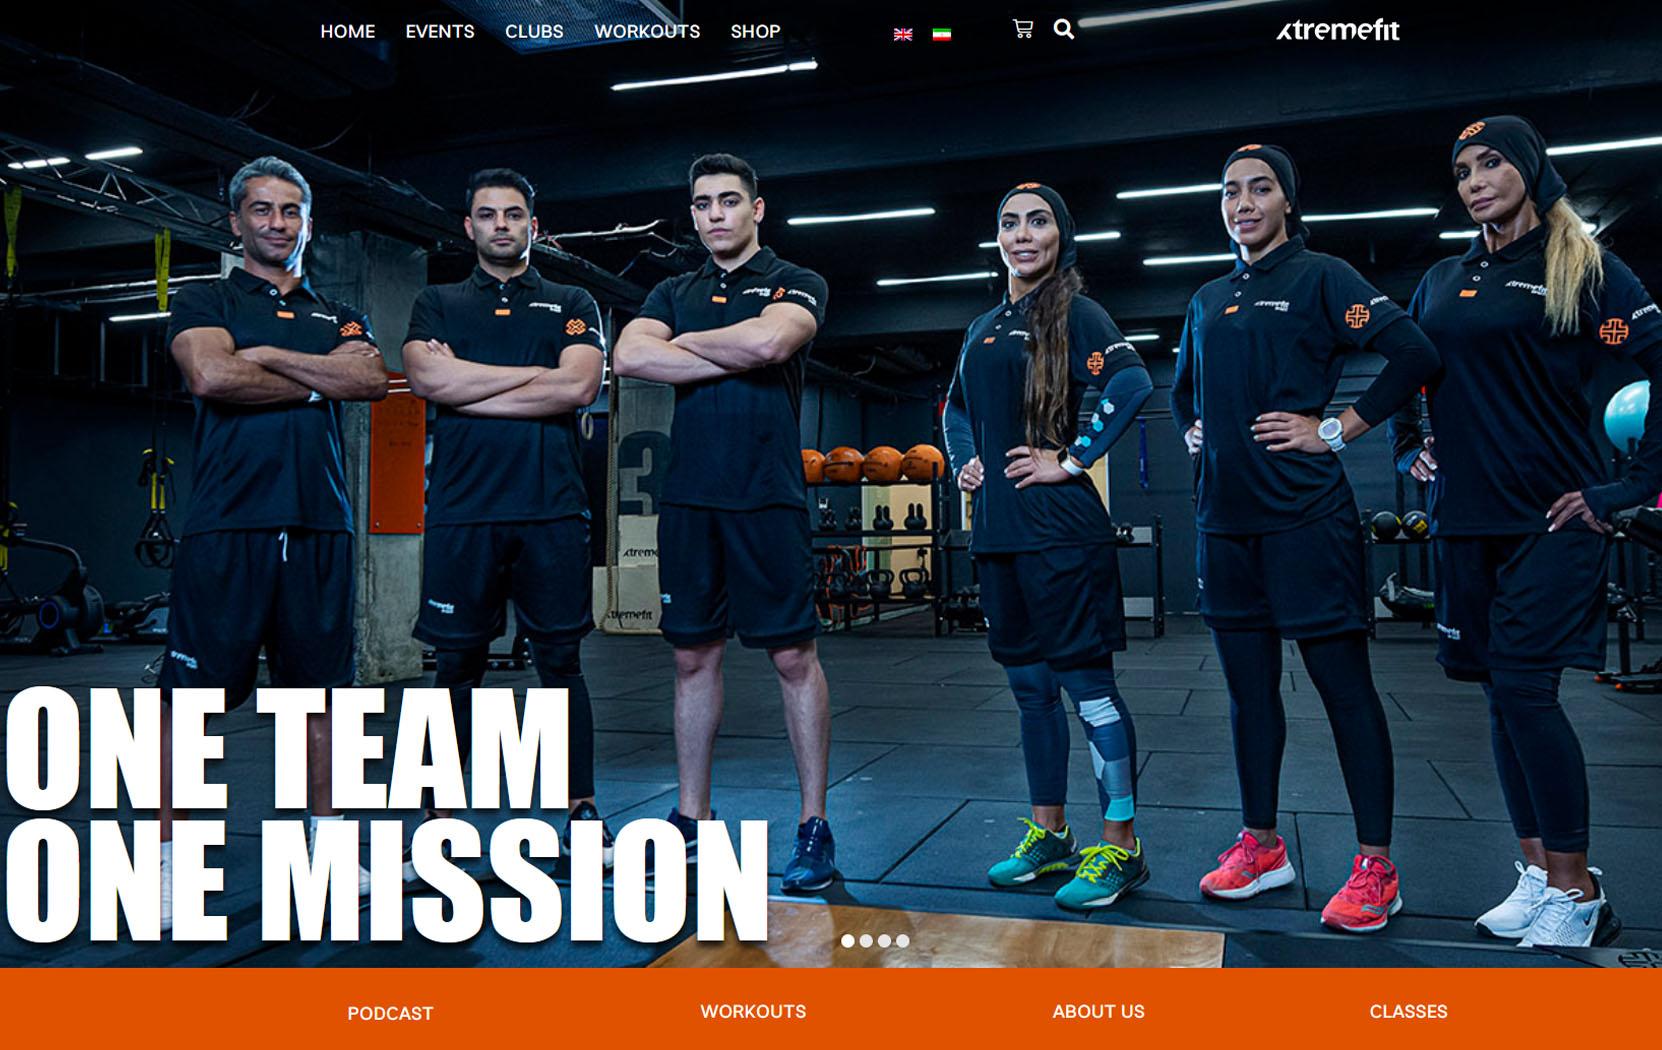 xff - طراحی سایت